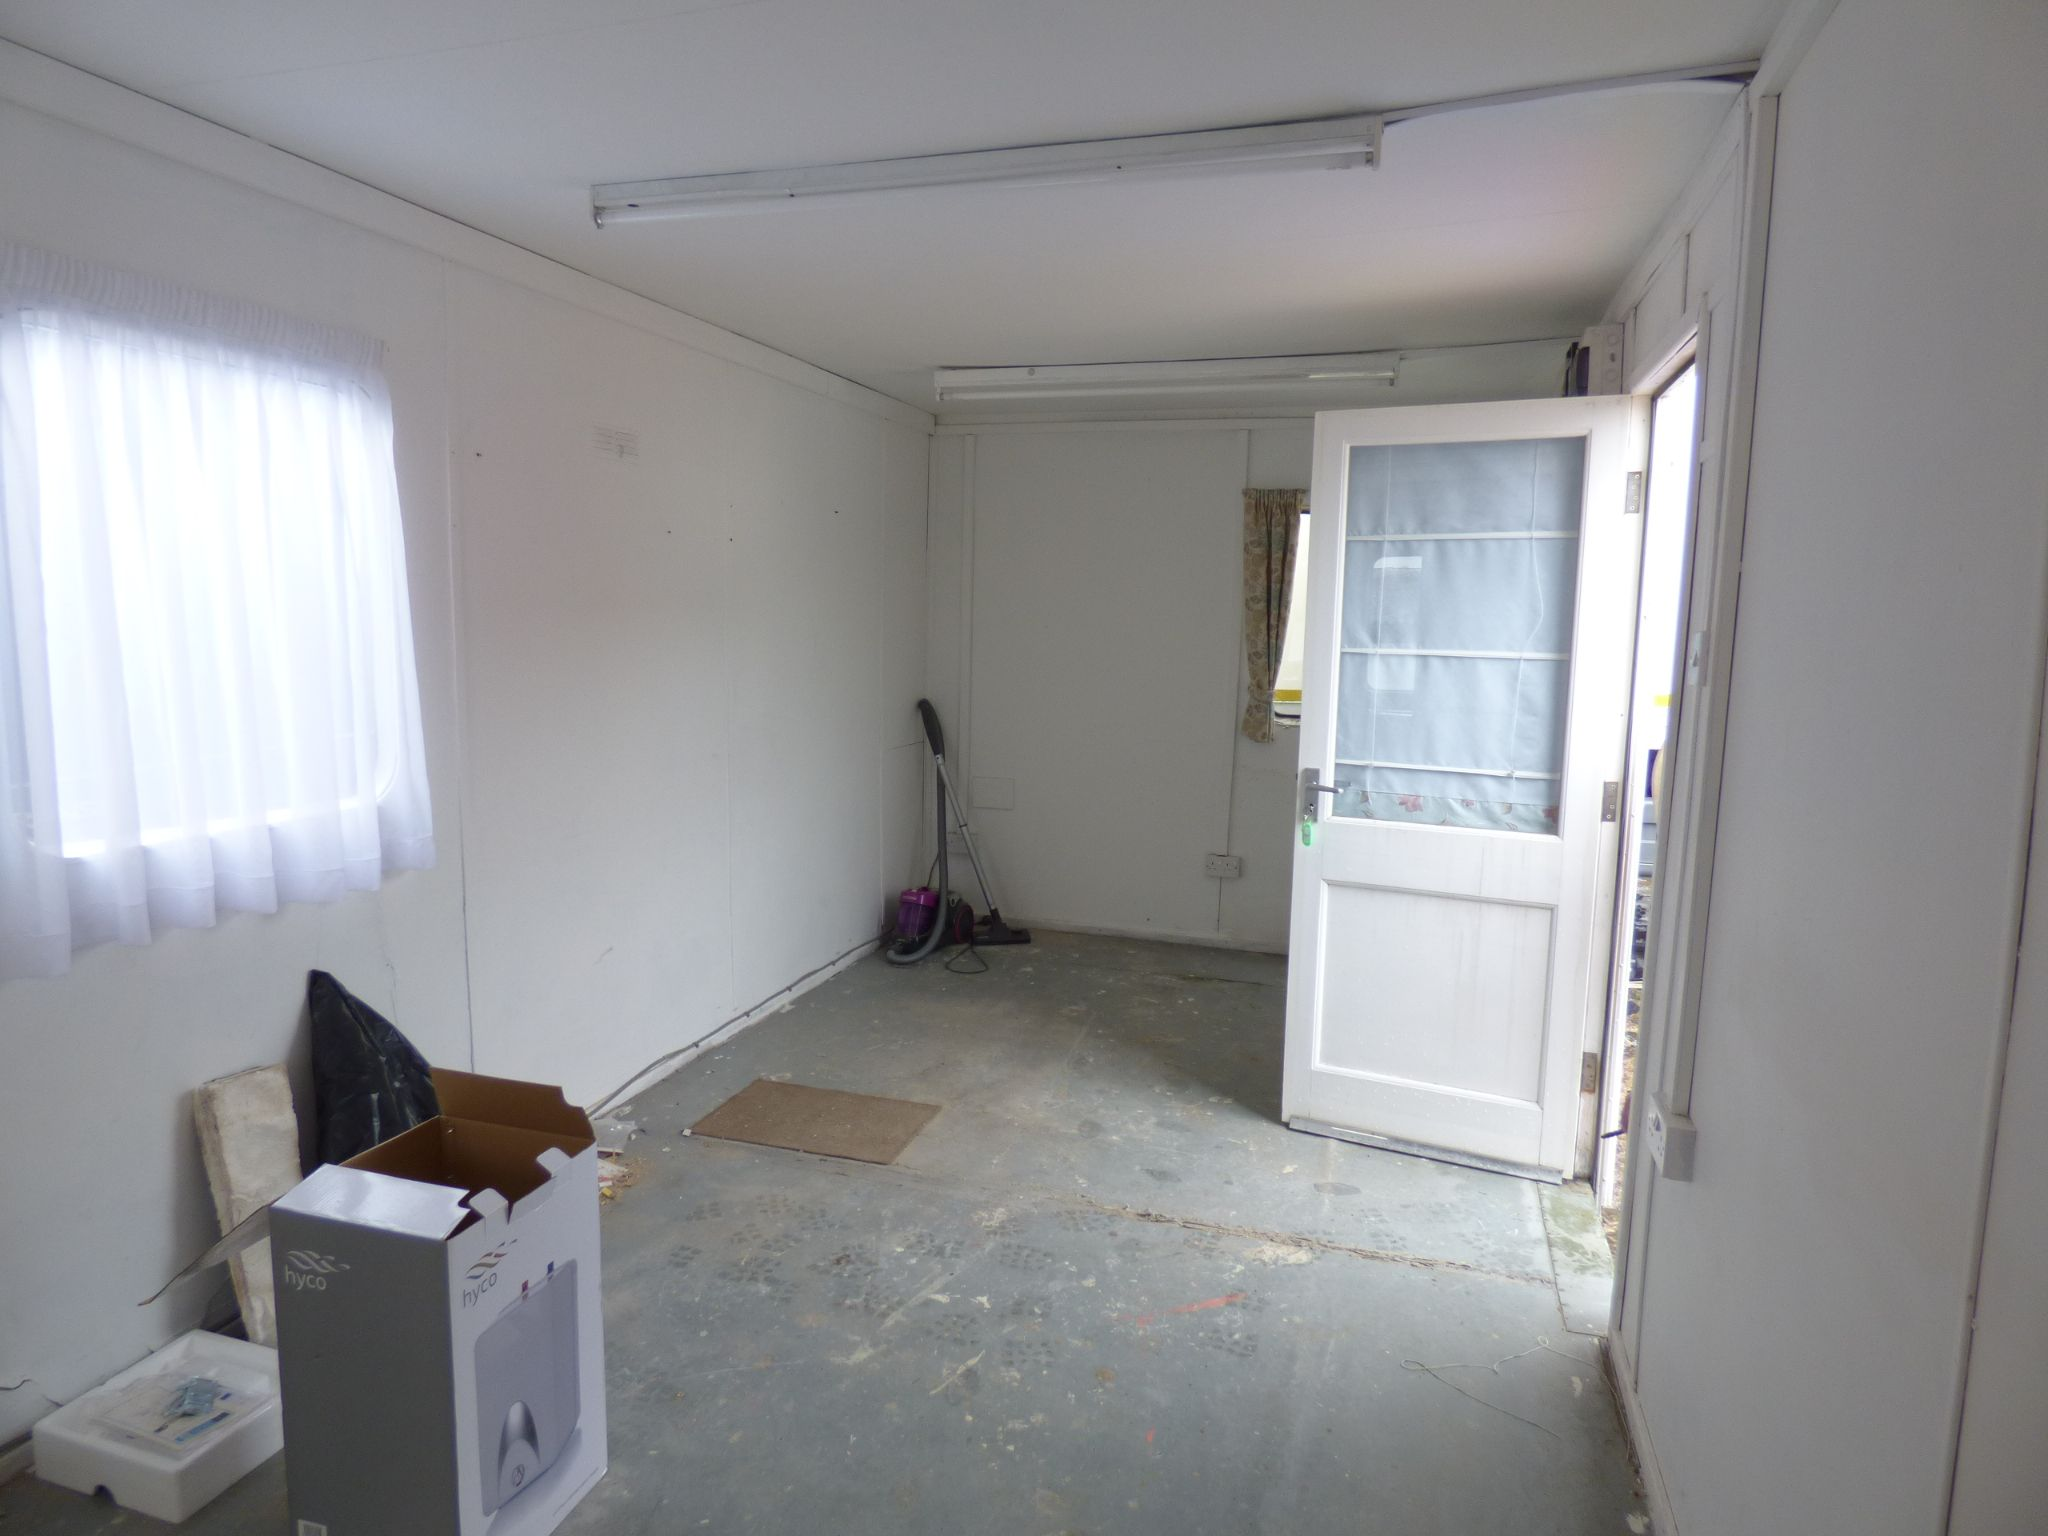 Office To Rent - Portacabin Photo 1